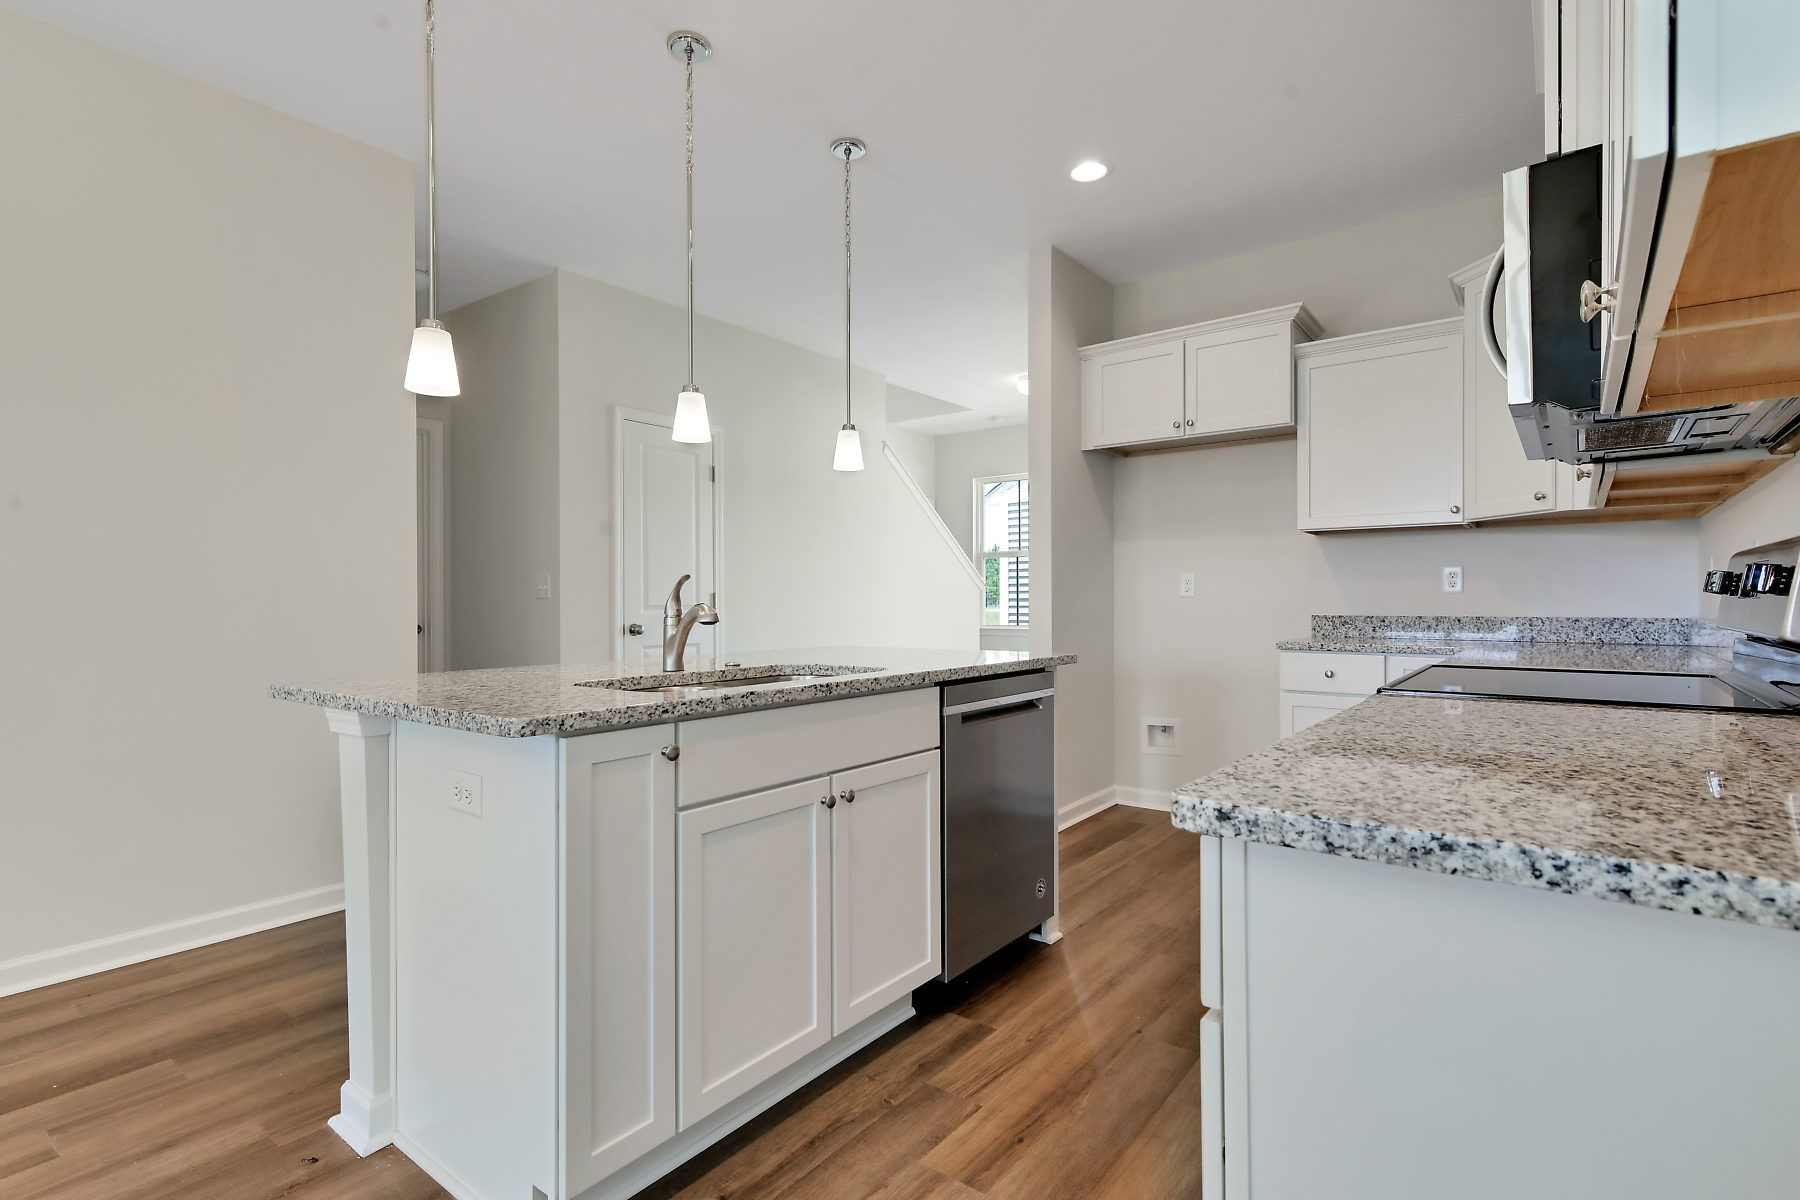 Kitchen featured in The Ridgeland By Village Park Homes in Hilton Head, SC